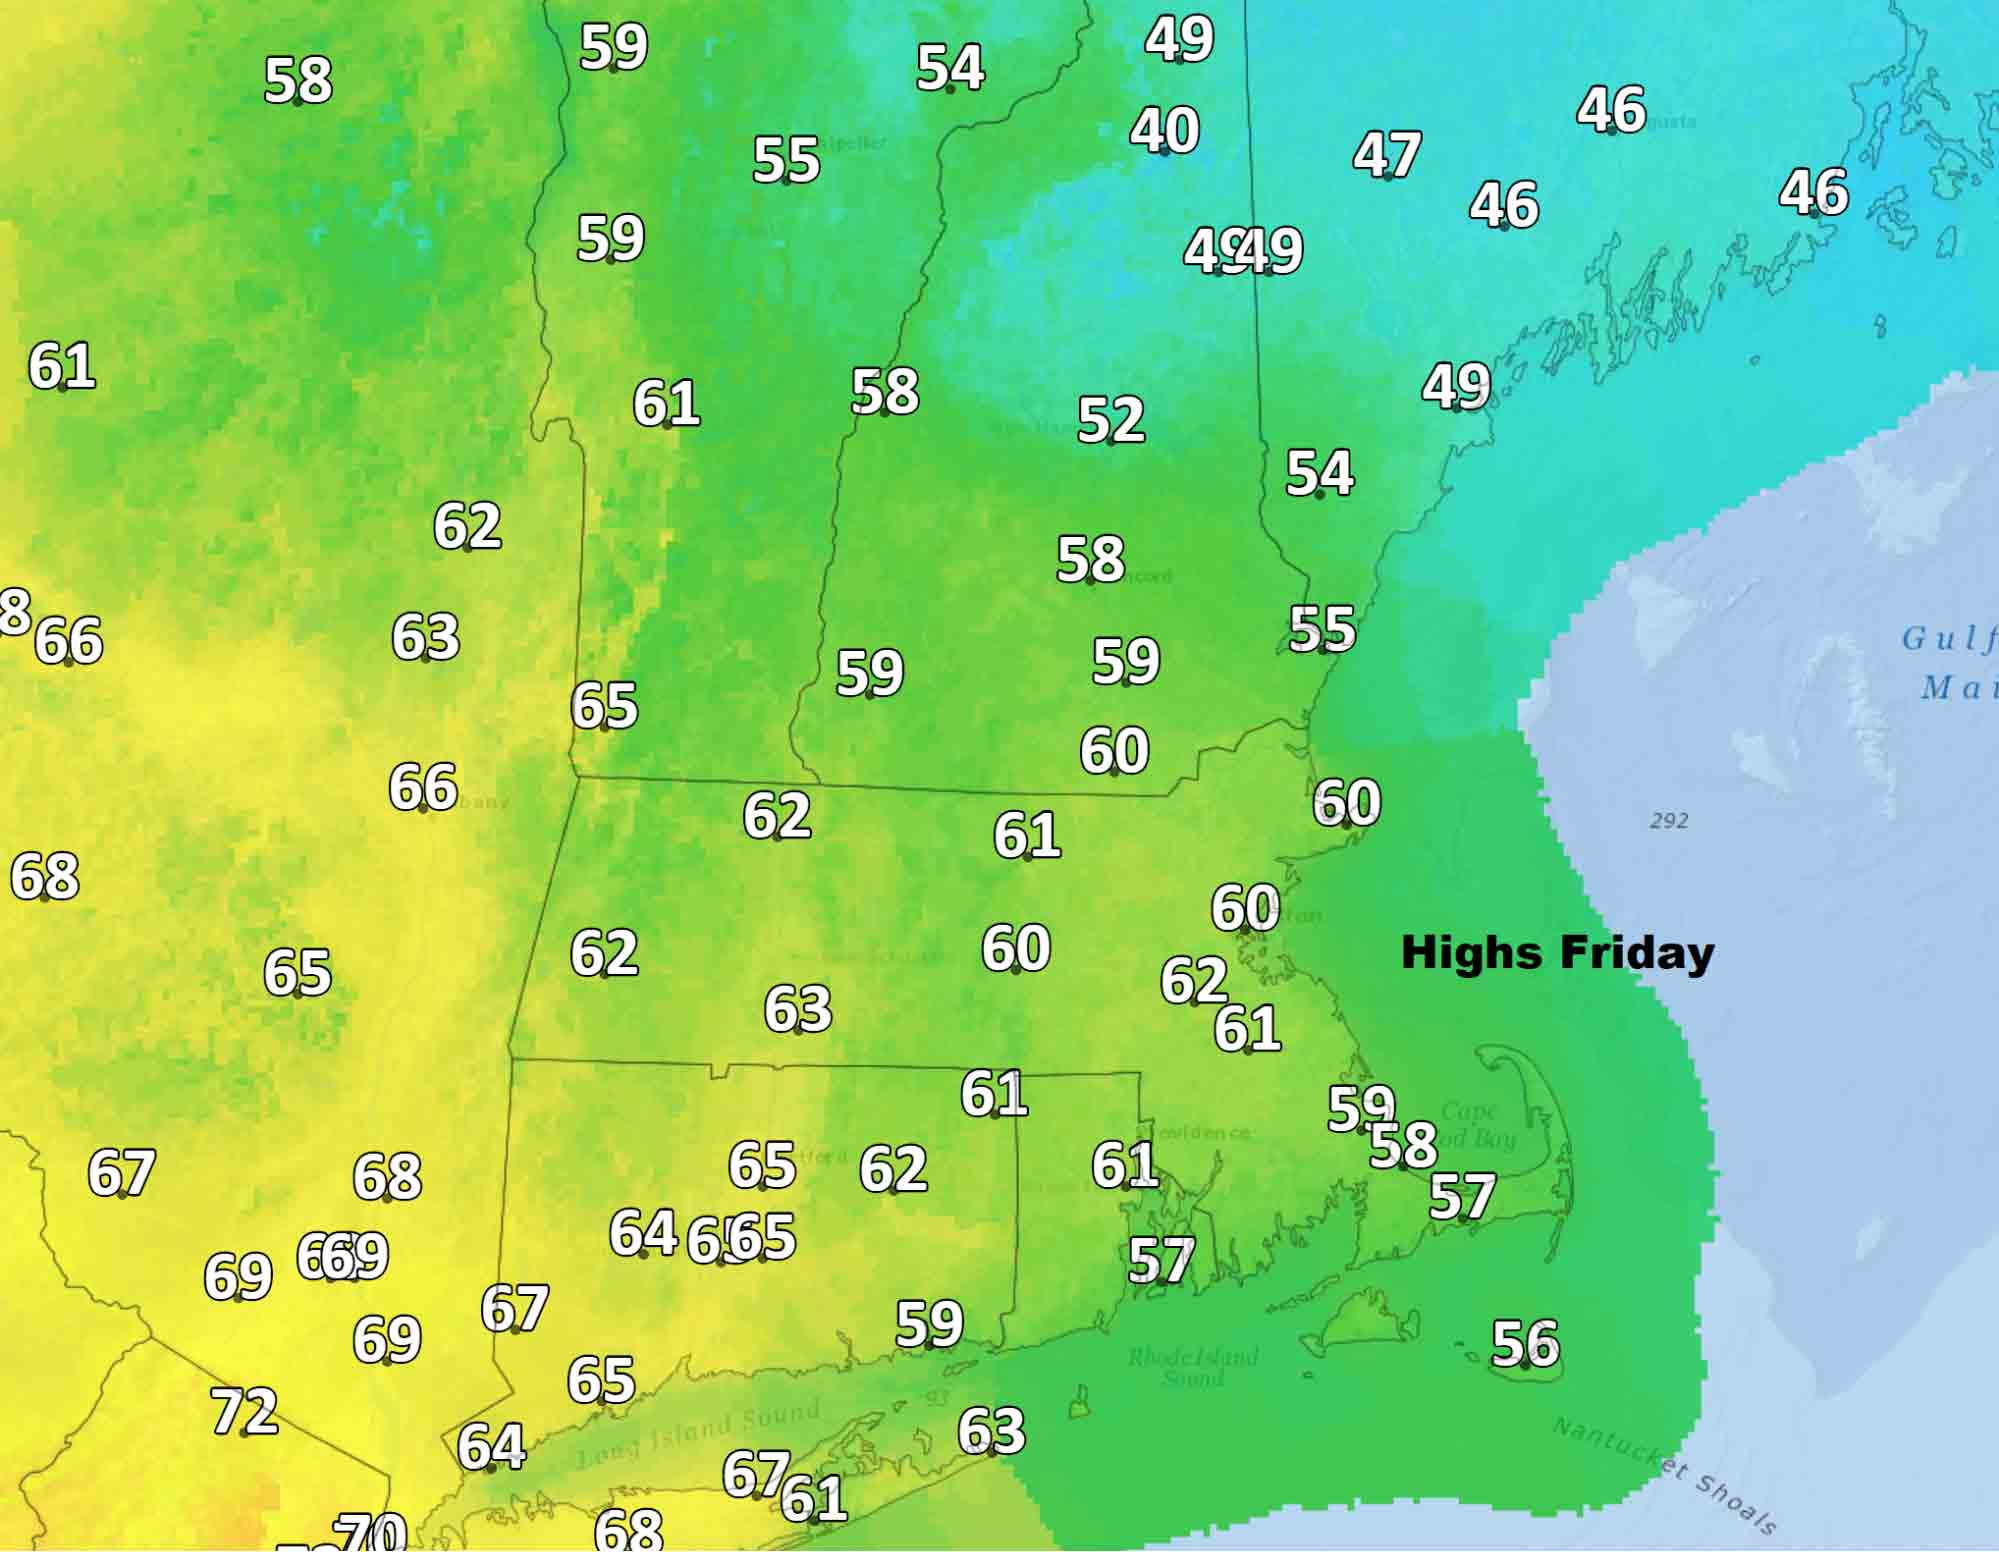 Friday temperatures